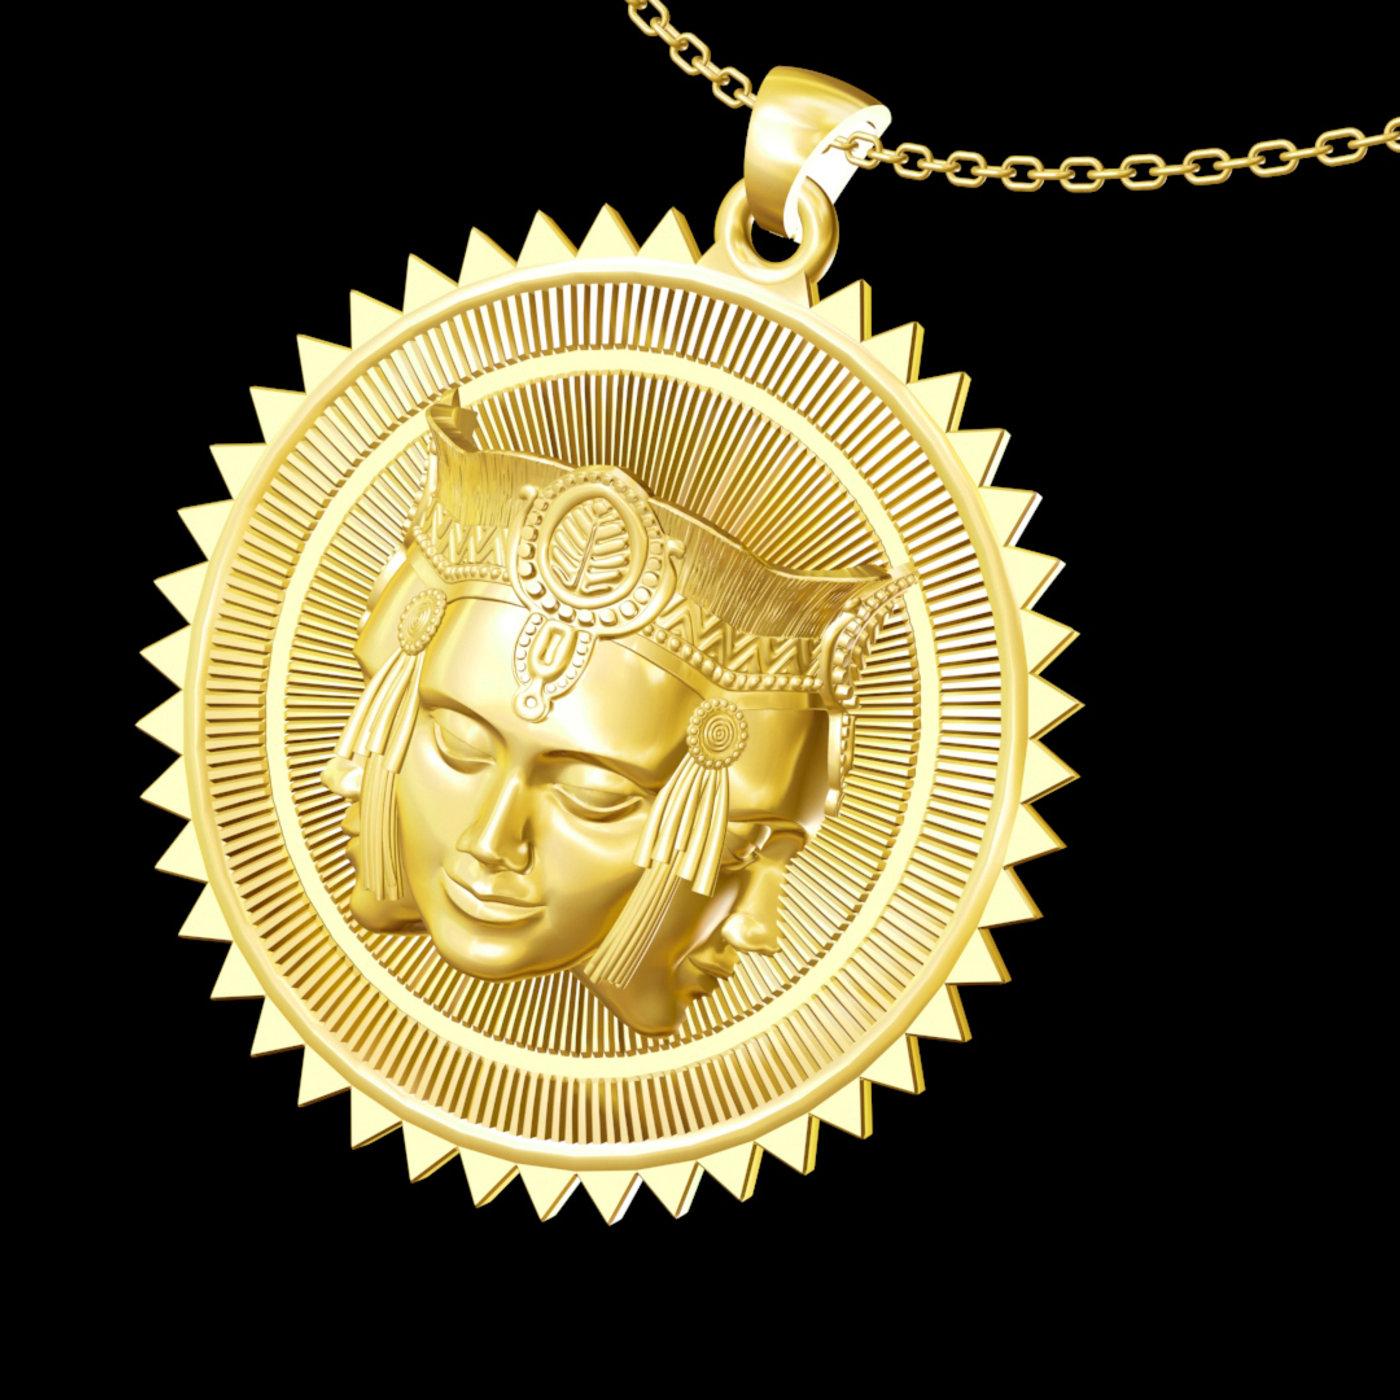 Brahma pendant jewelry gold necklace medallion 3D print model